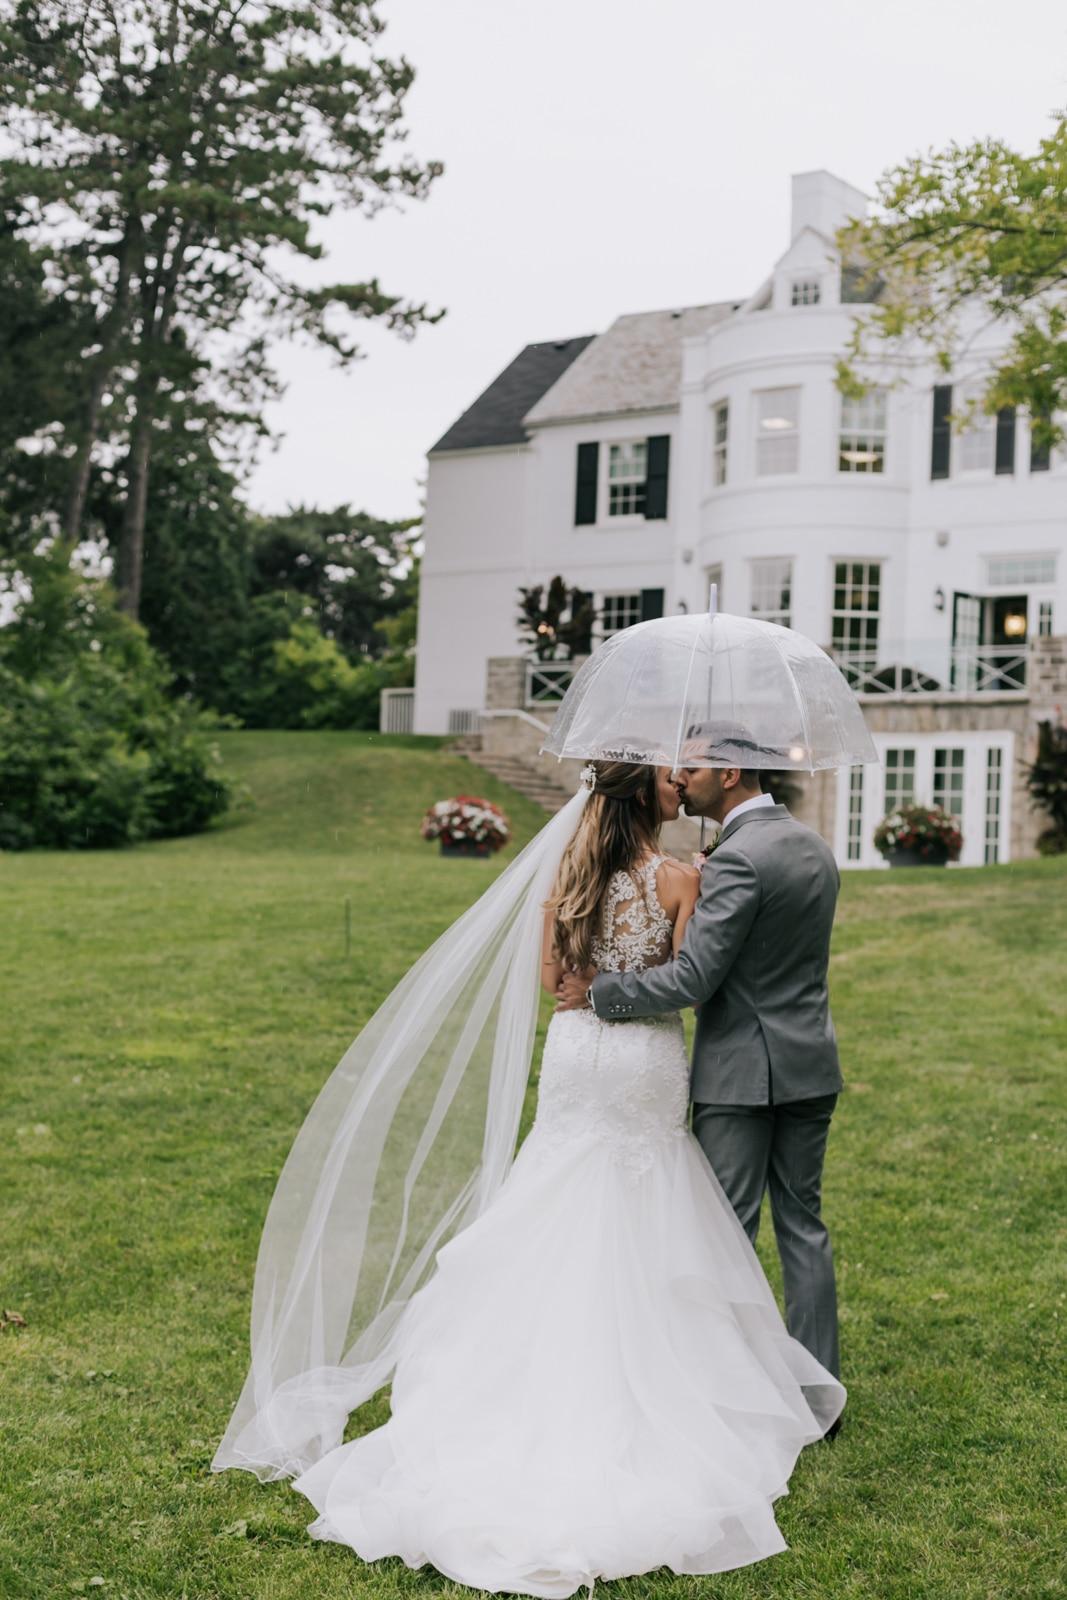 Designed Dream Weddings